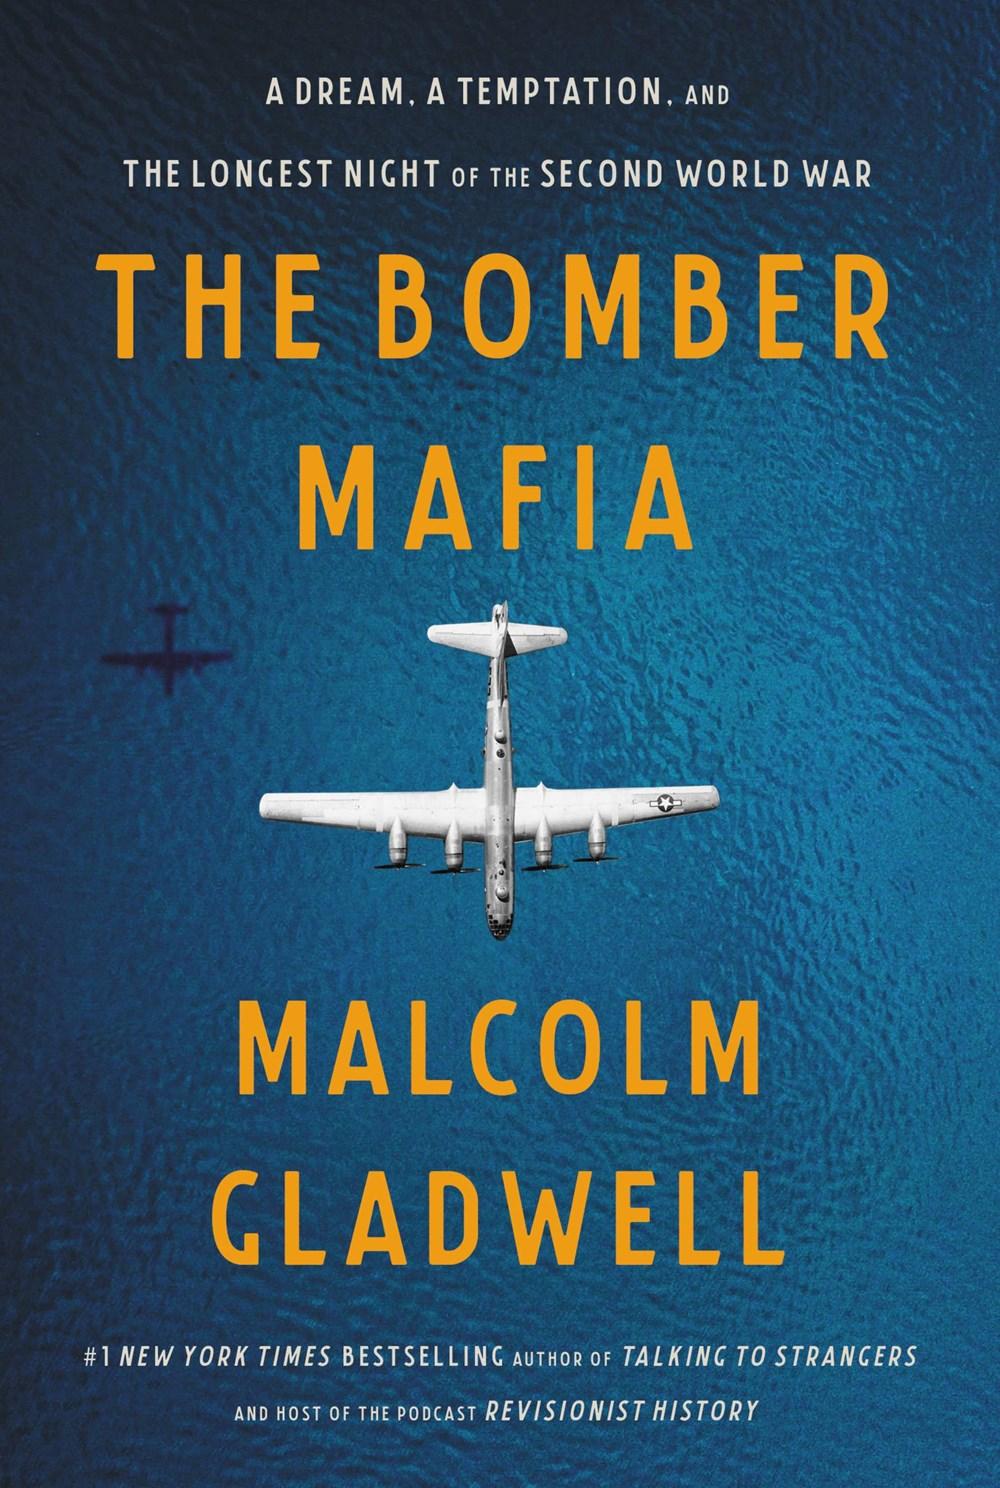 The Bomber Mafia cover image